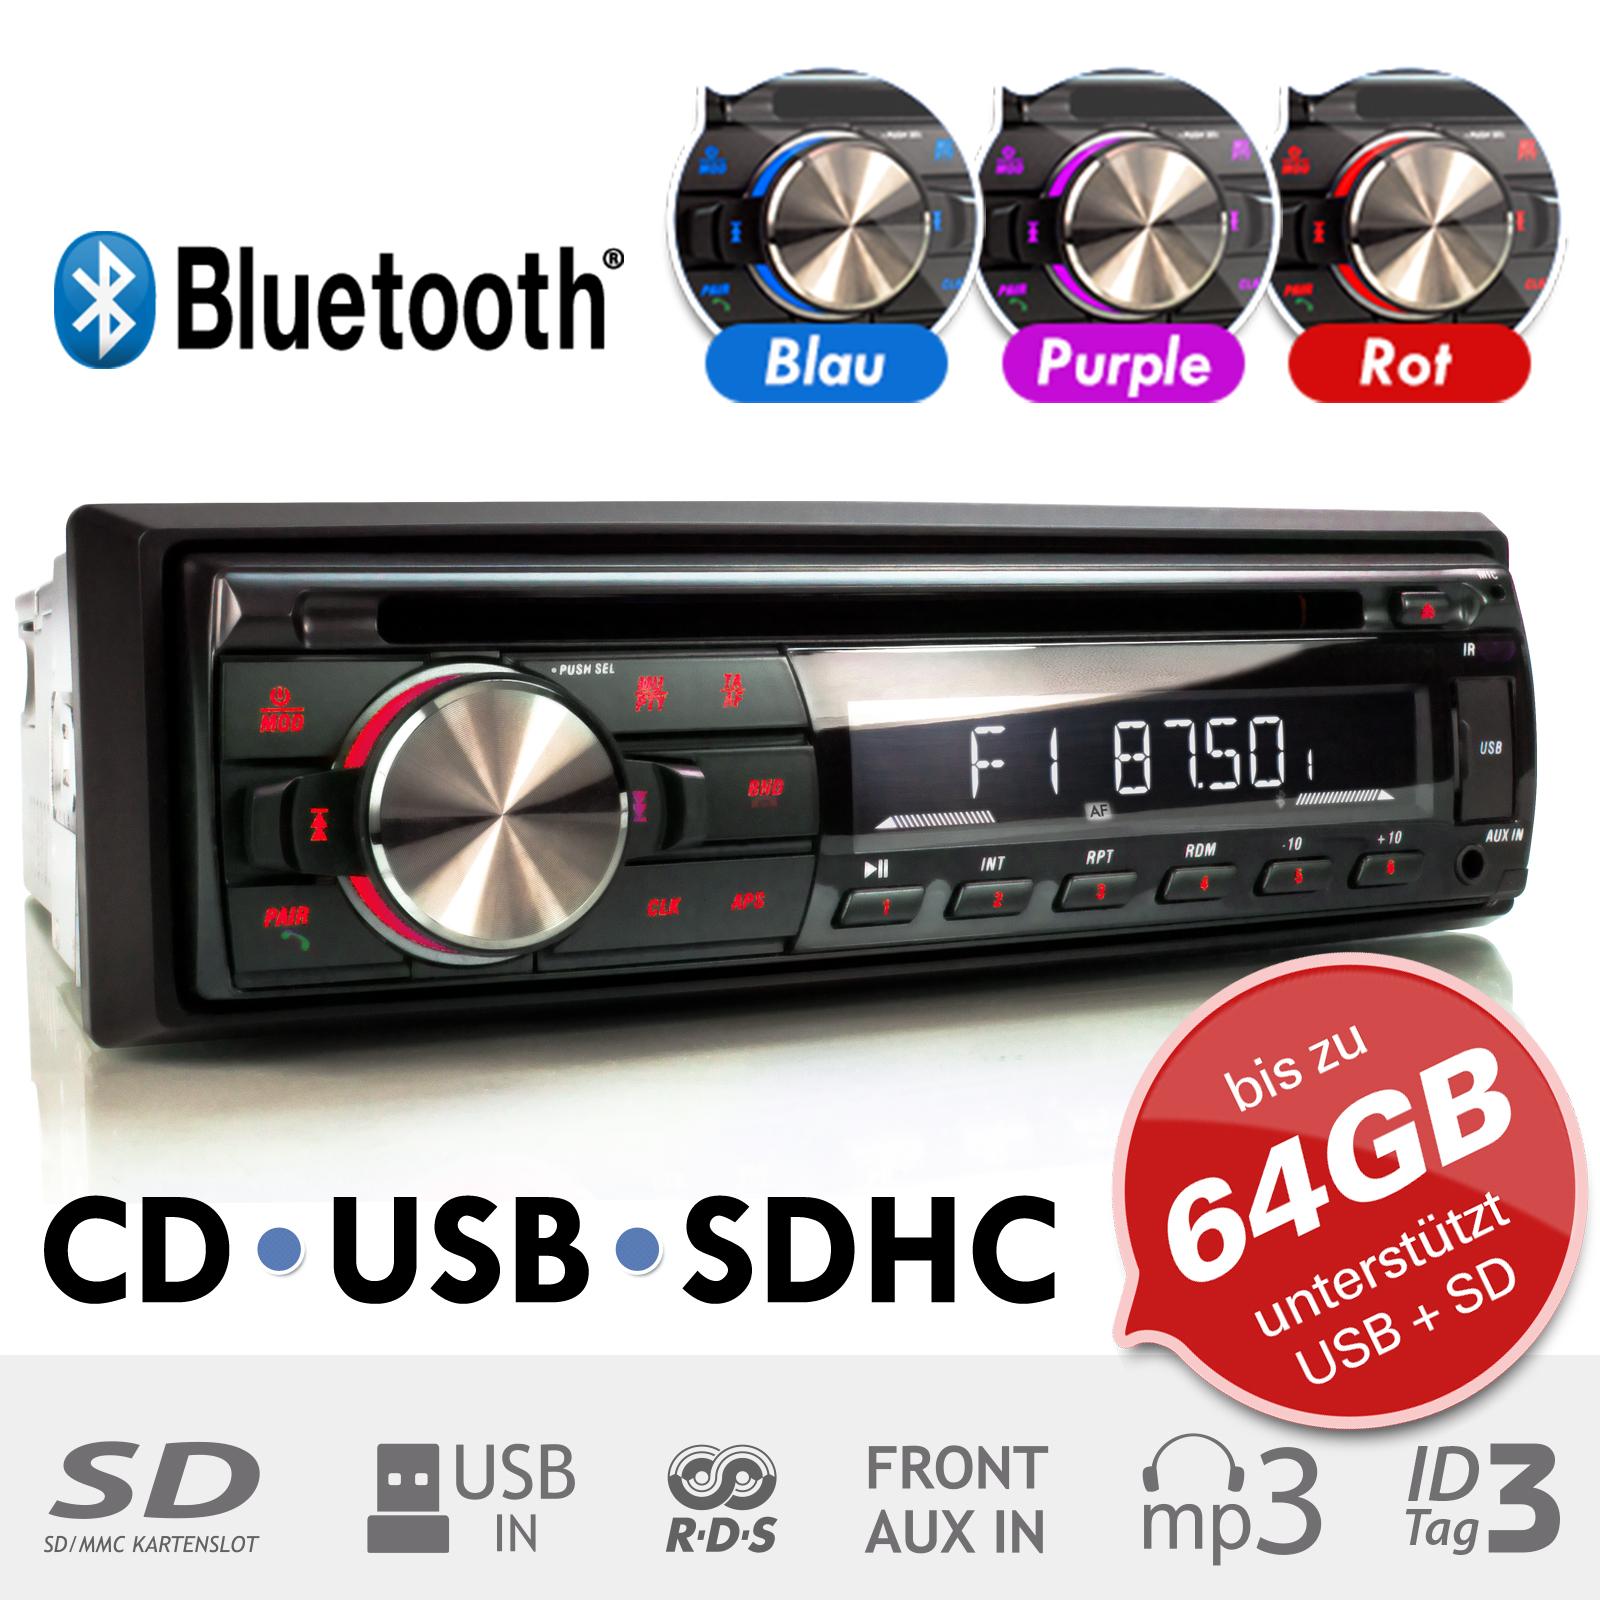 autoradio mit bluetooth mp3 cd player usb sd 64gb aux rds. Black Bedroom Furniture Sets. Home Design Ideas